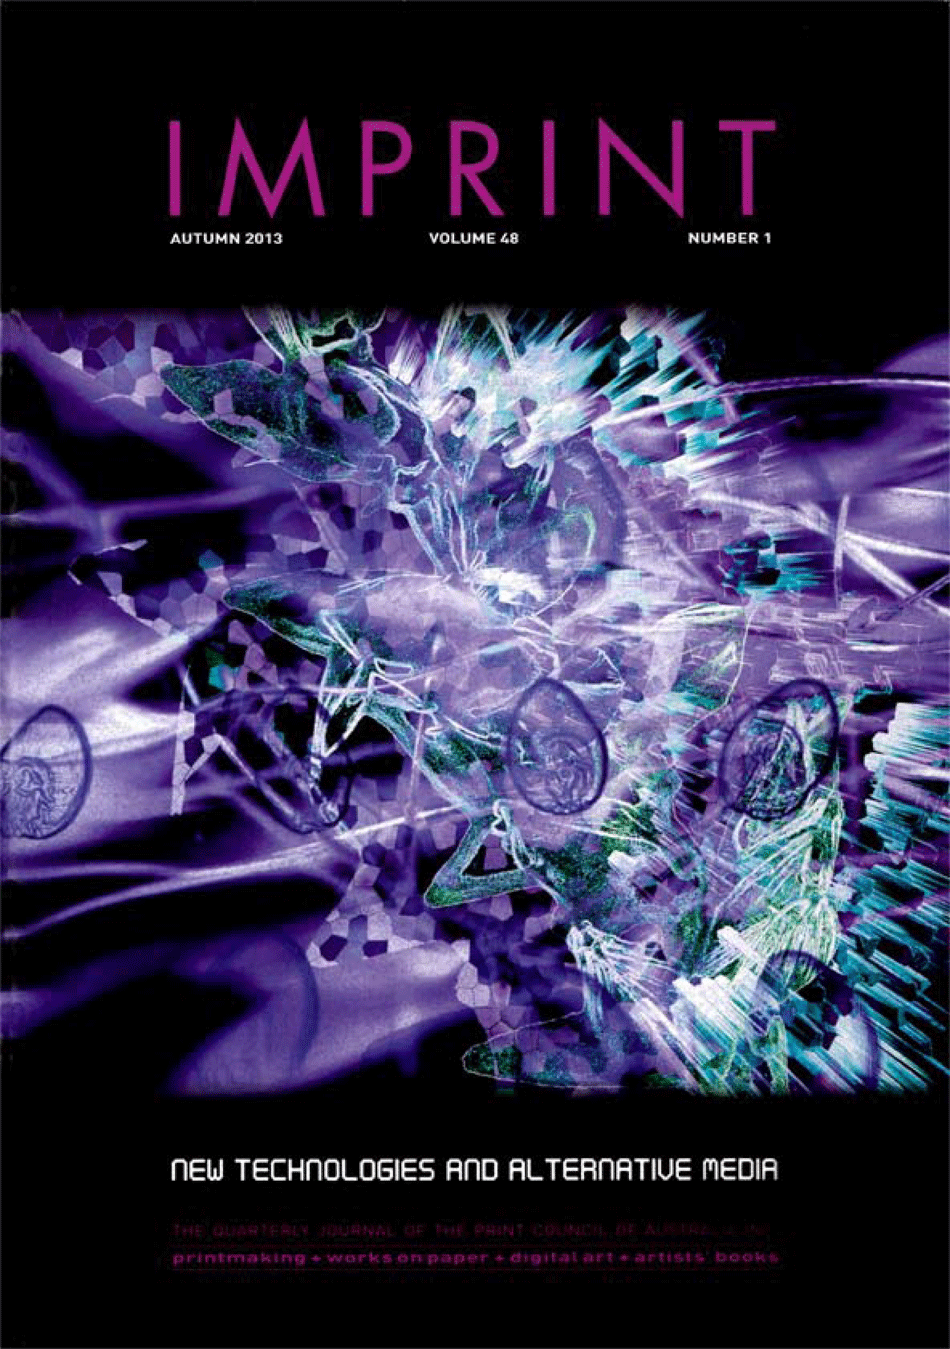 IMPRINT Cover Image, 'MAGICal B' by Eleanor Gates-Stuart